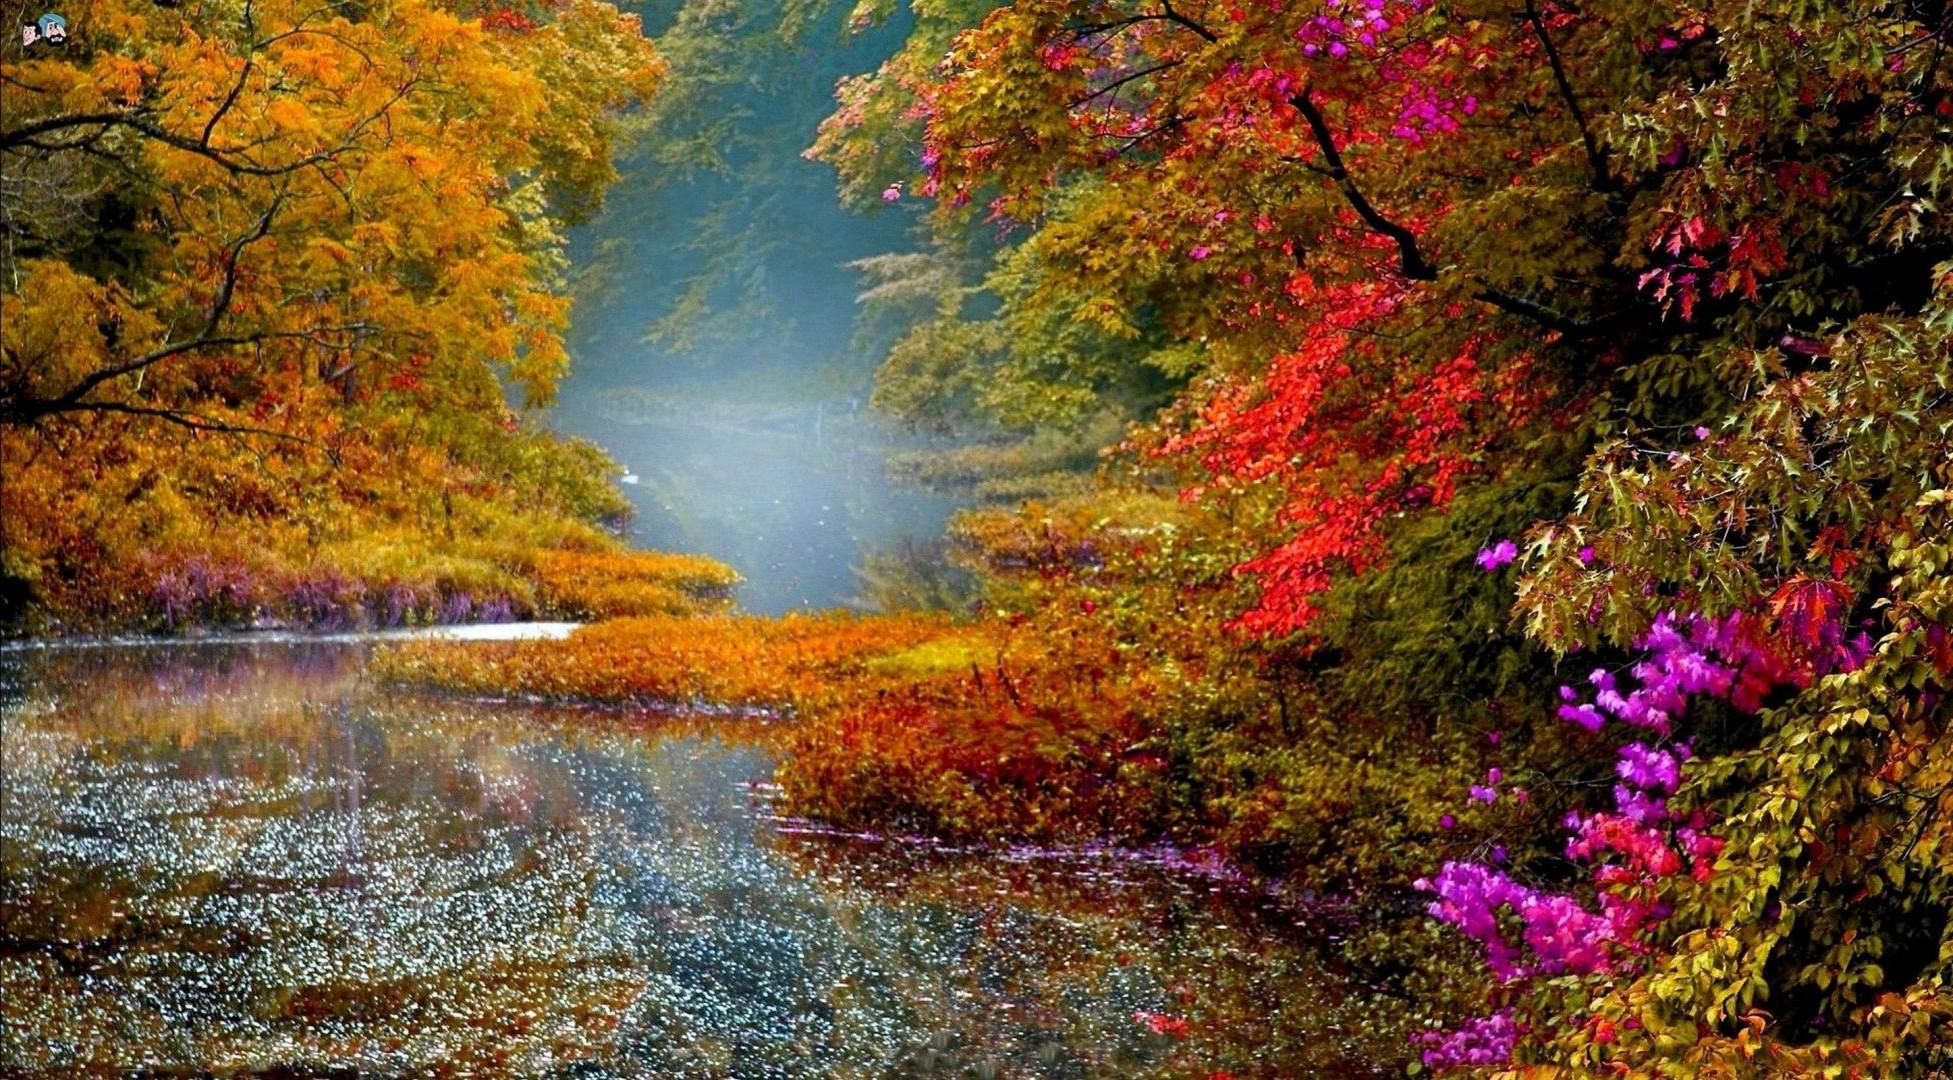 Nature river trees foliage autumn landscape - Phone wallpapers